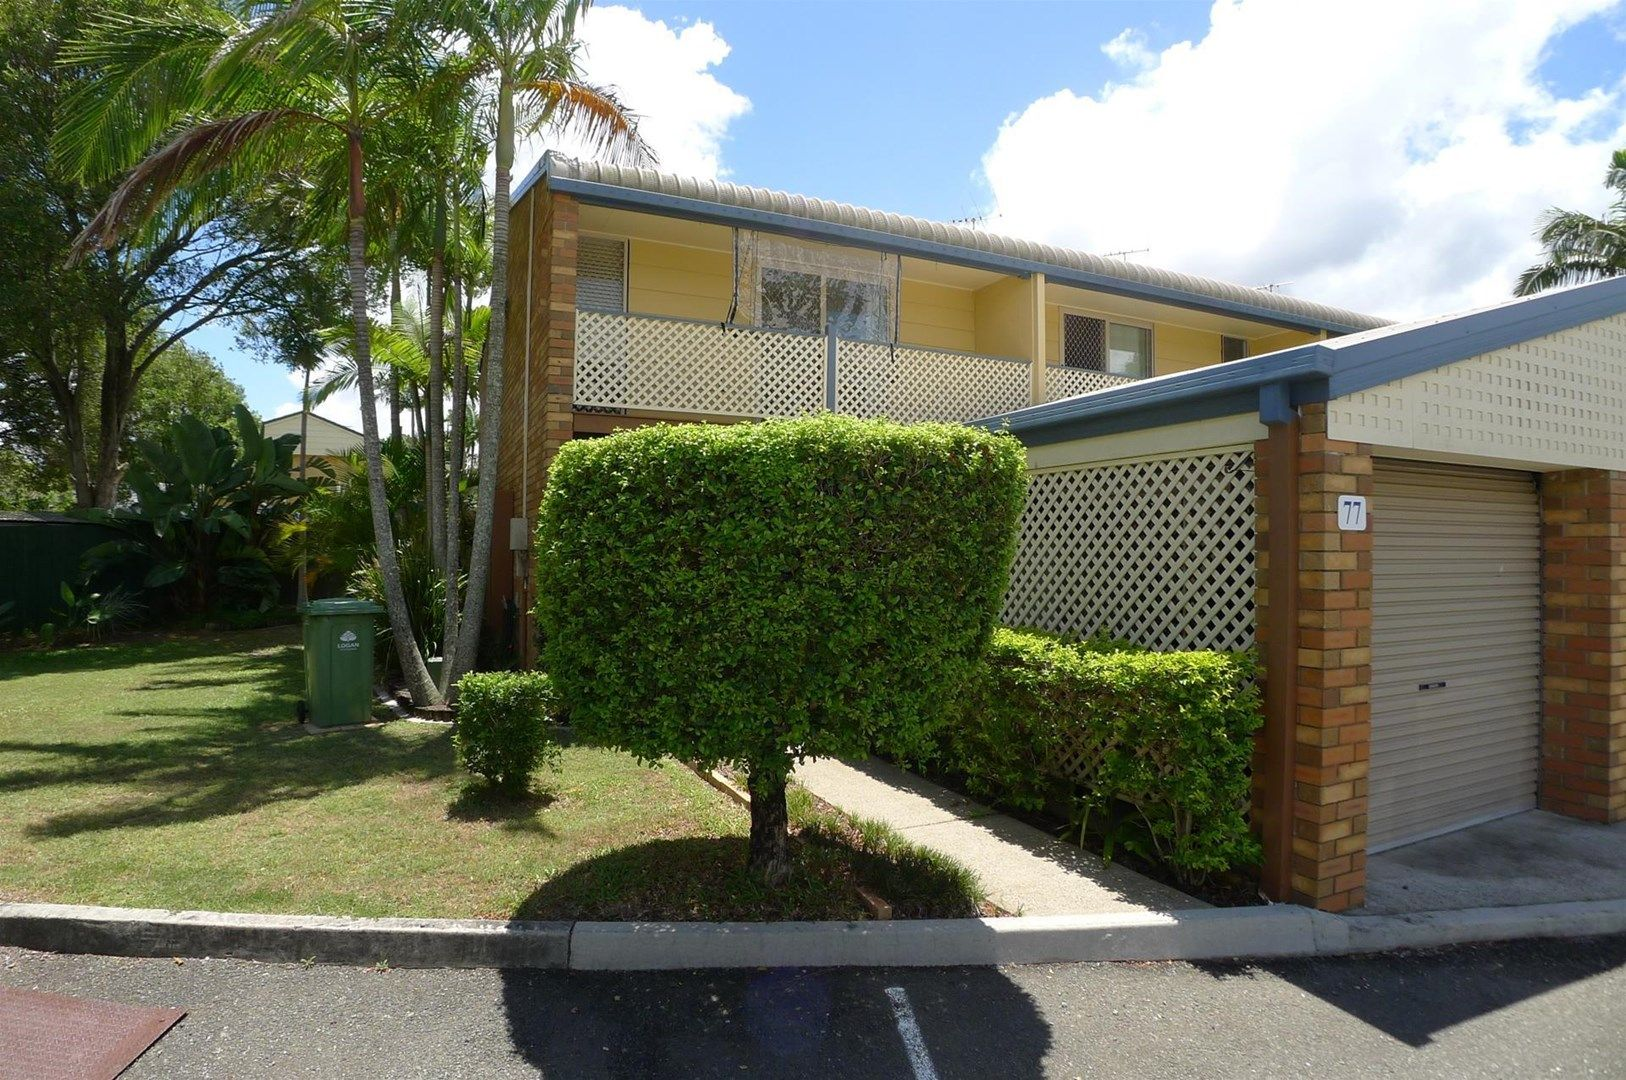 77/8 Briggs Road, Springwood QLD 4127, Image 0